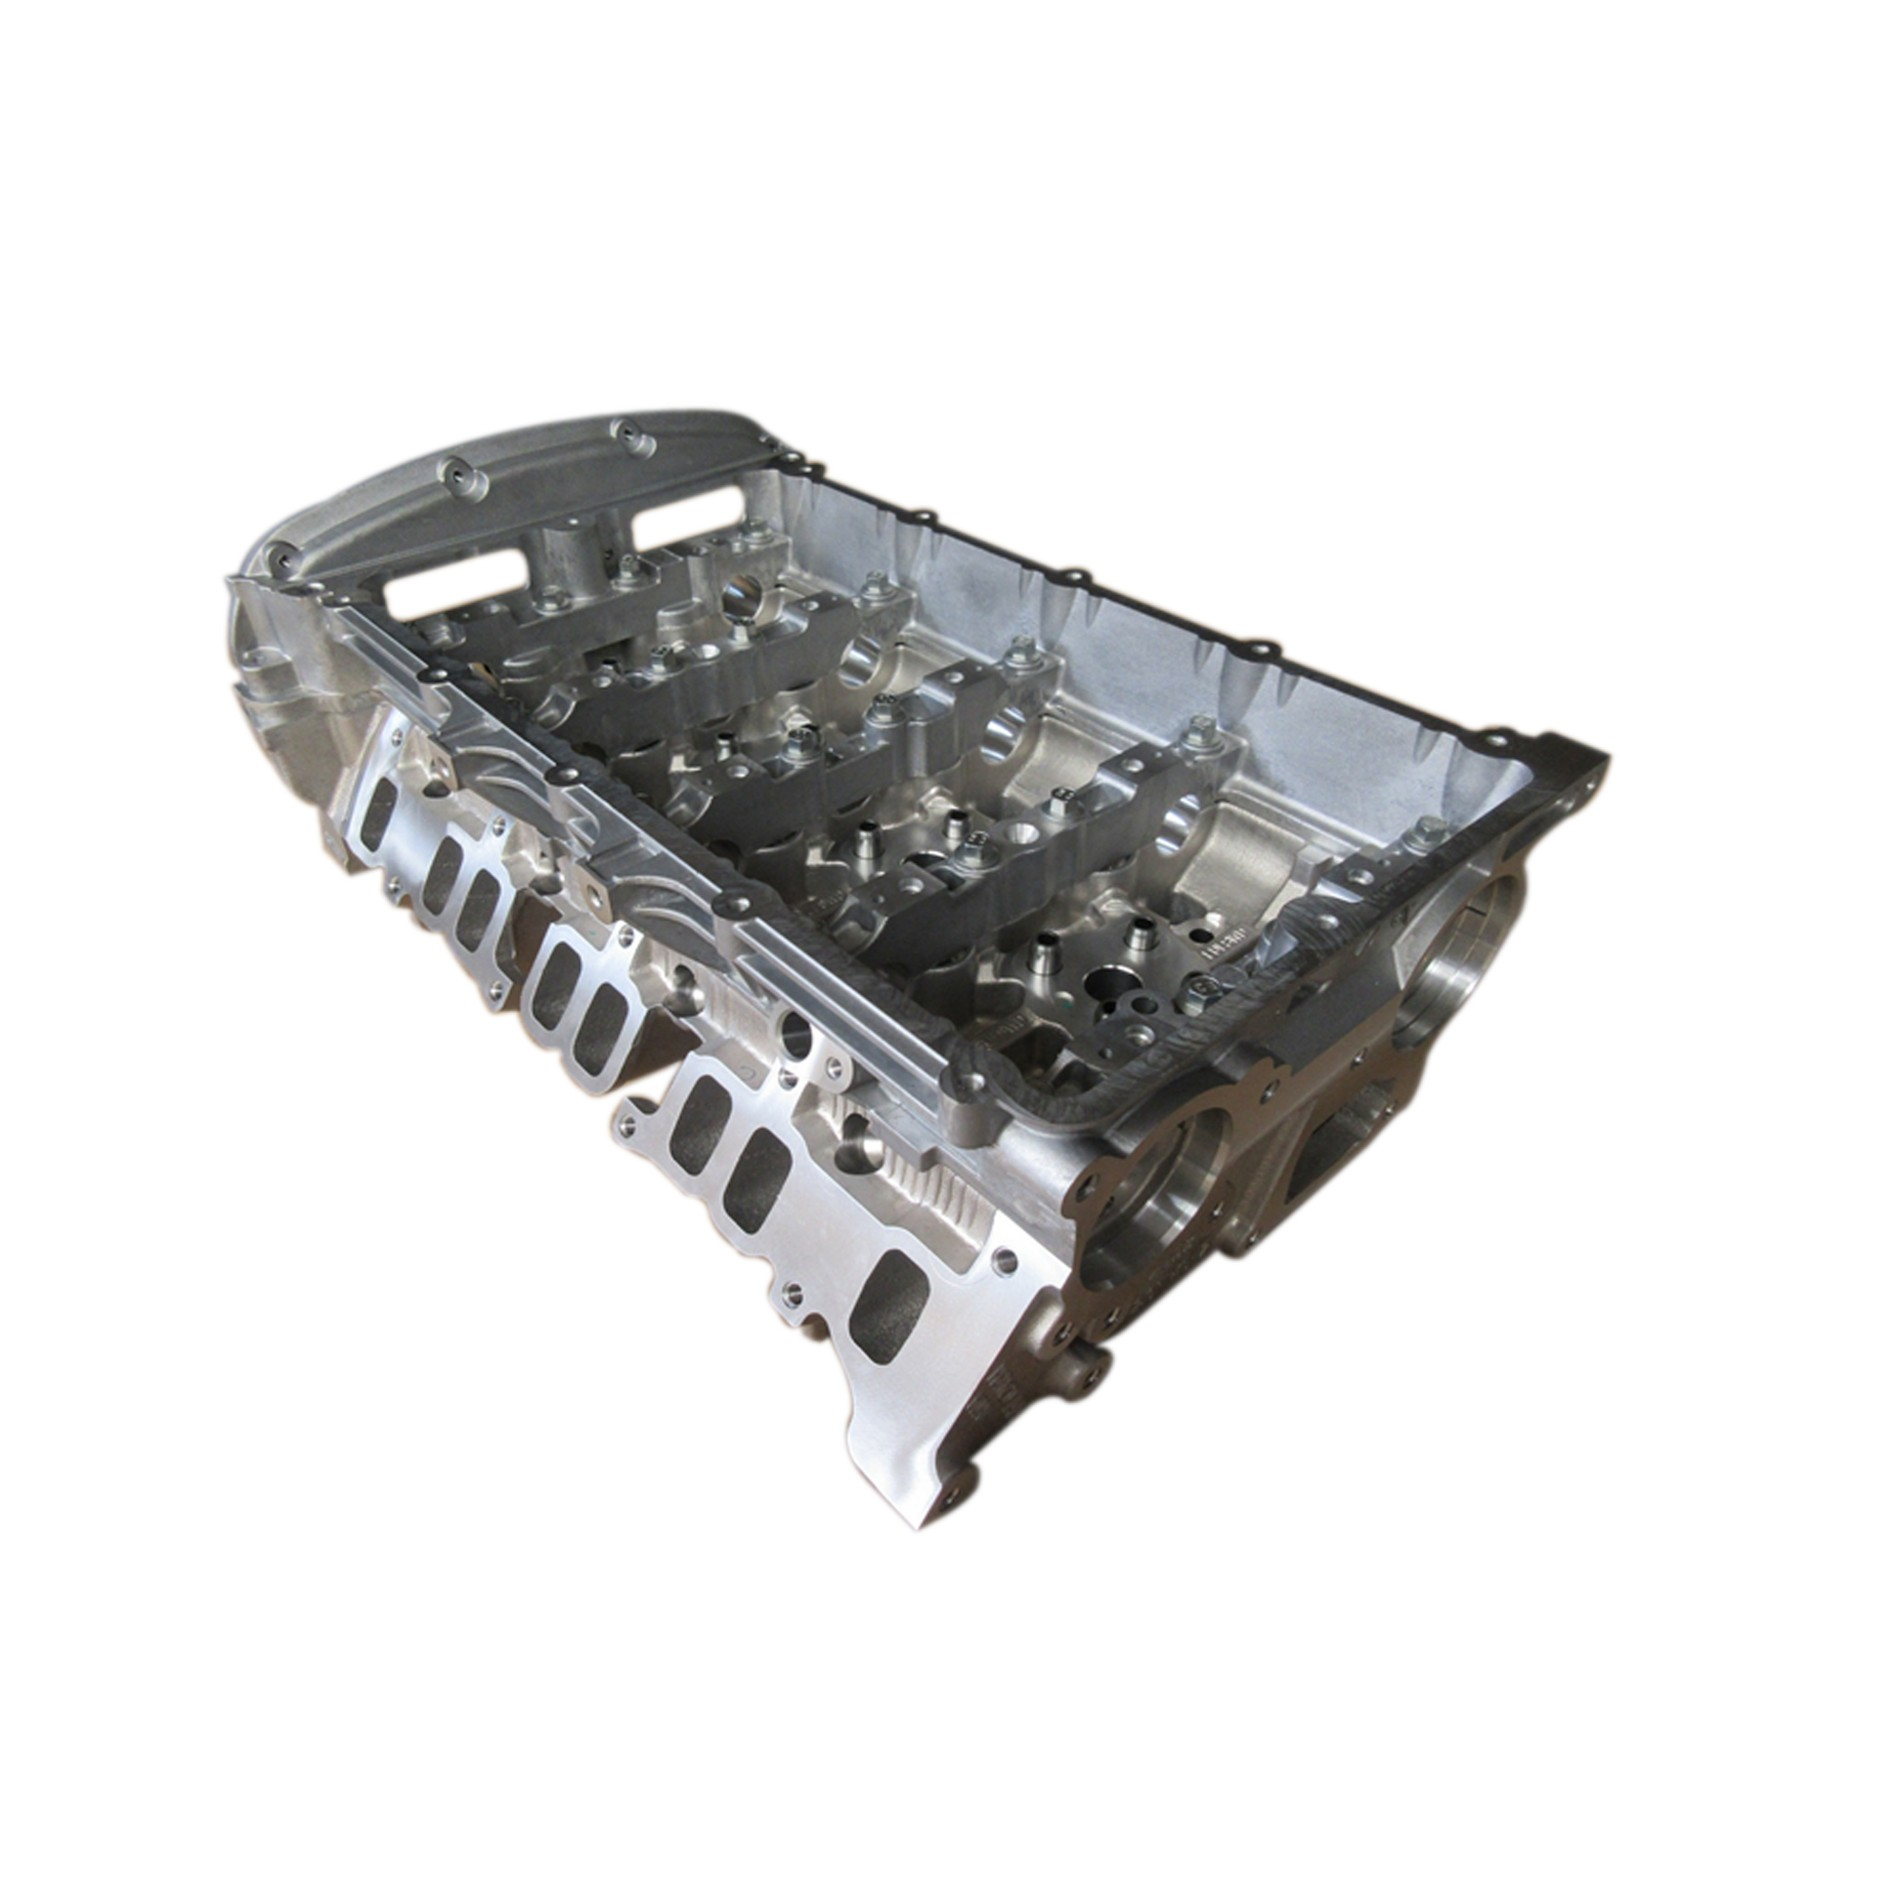 Ford Transit V348 2.2L 2.0L Cylinder Head ASM BK2Q-6049-AD